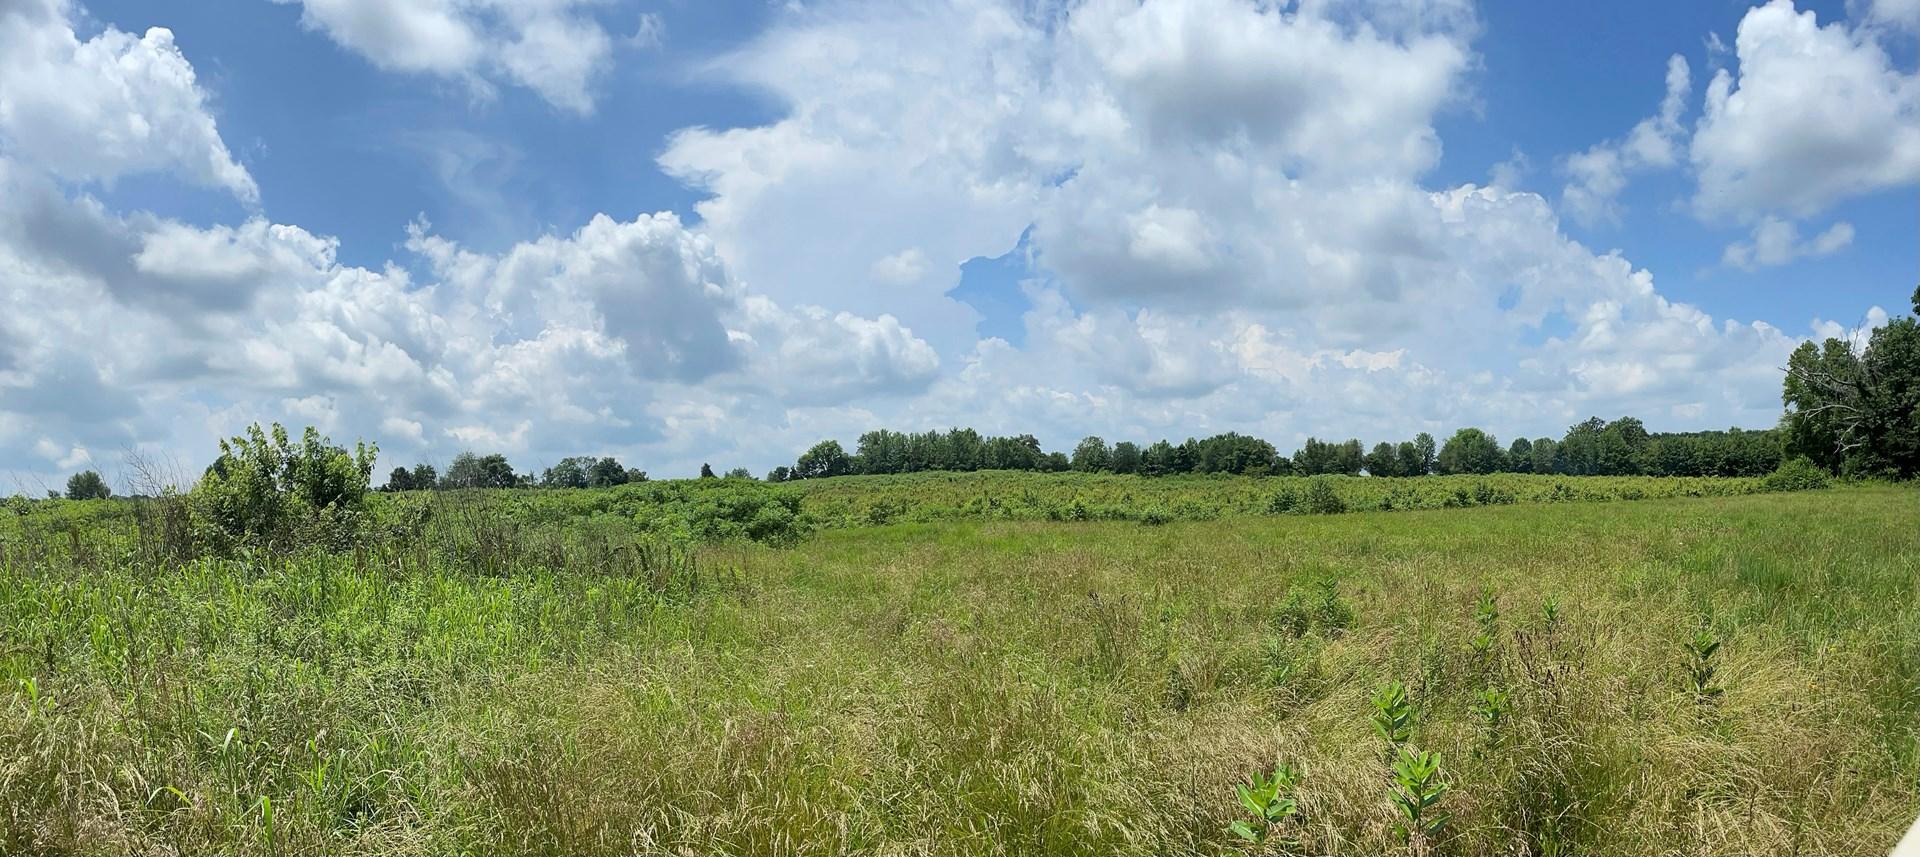 32 Acres, Vacant land, Baby farm